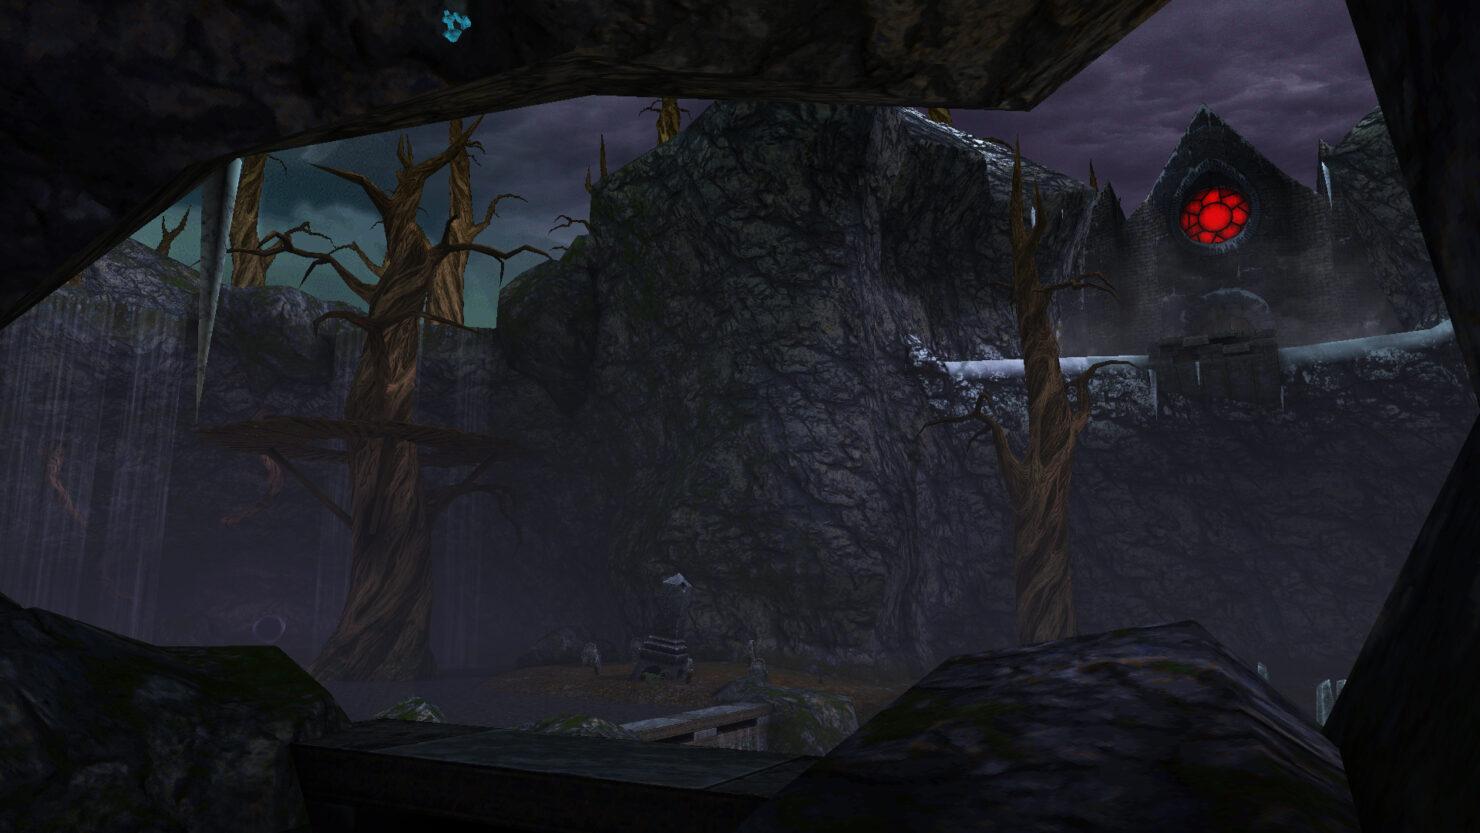 wrath-aeon-of-fury-early-access-launch-02-screenshot-2